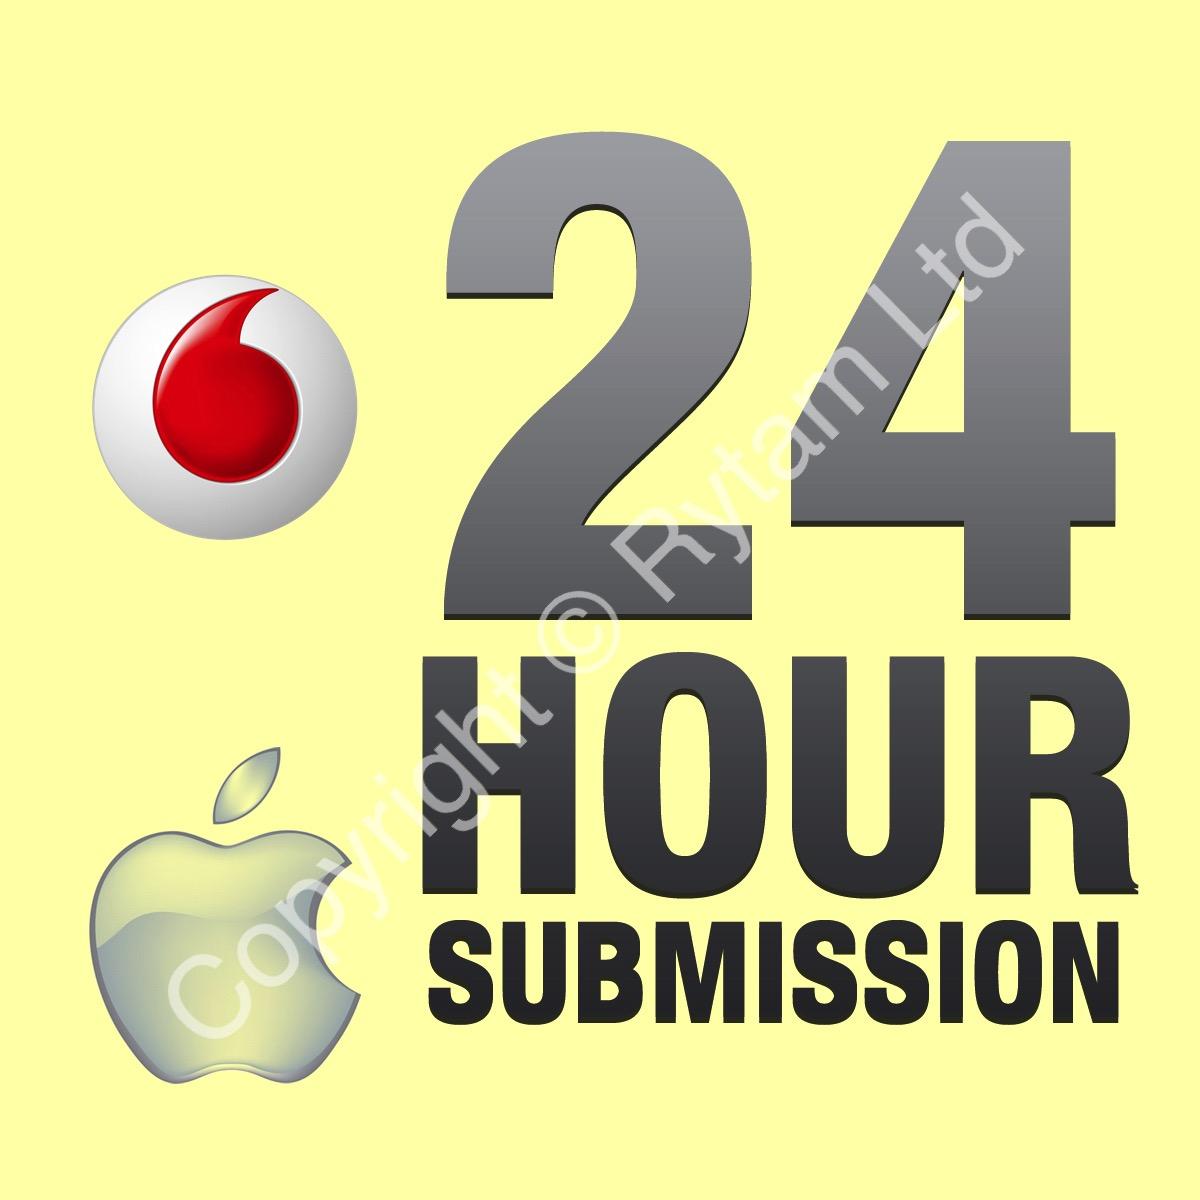 Vodafone UK - Apple iPhone 11 / 11 Pro / 11 Pro Max / 12 Unlock Service